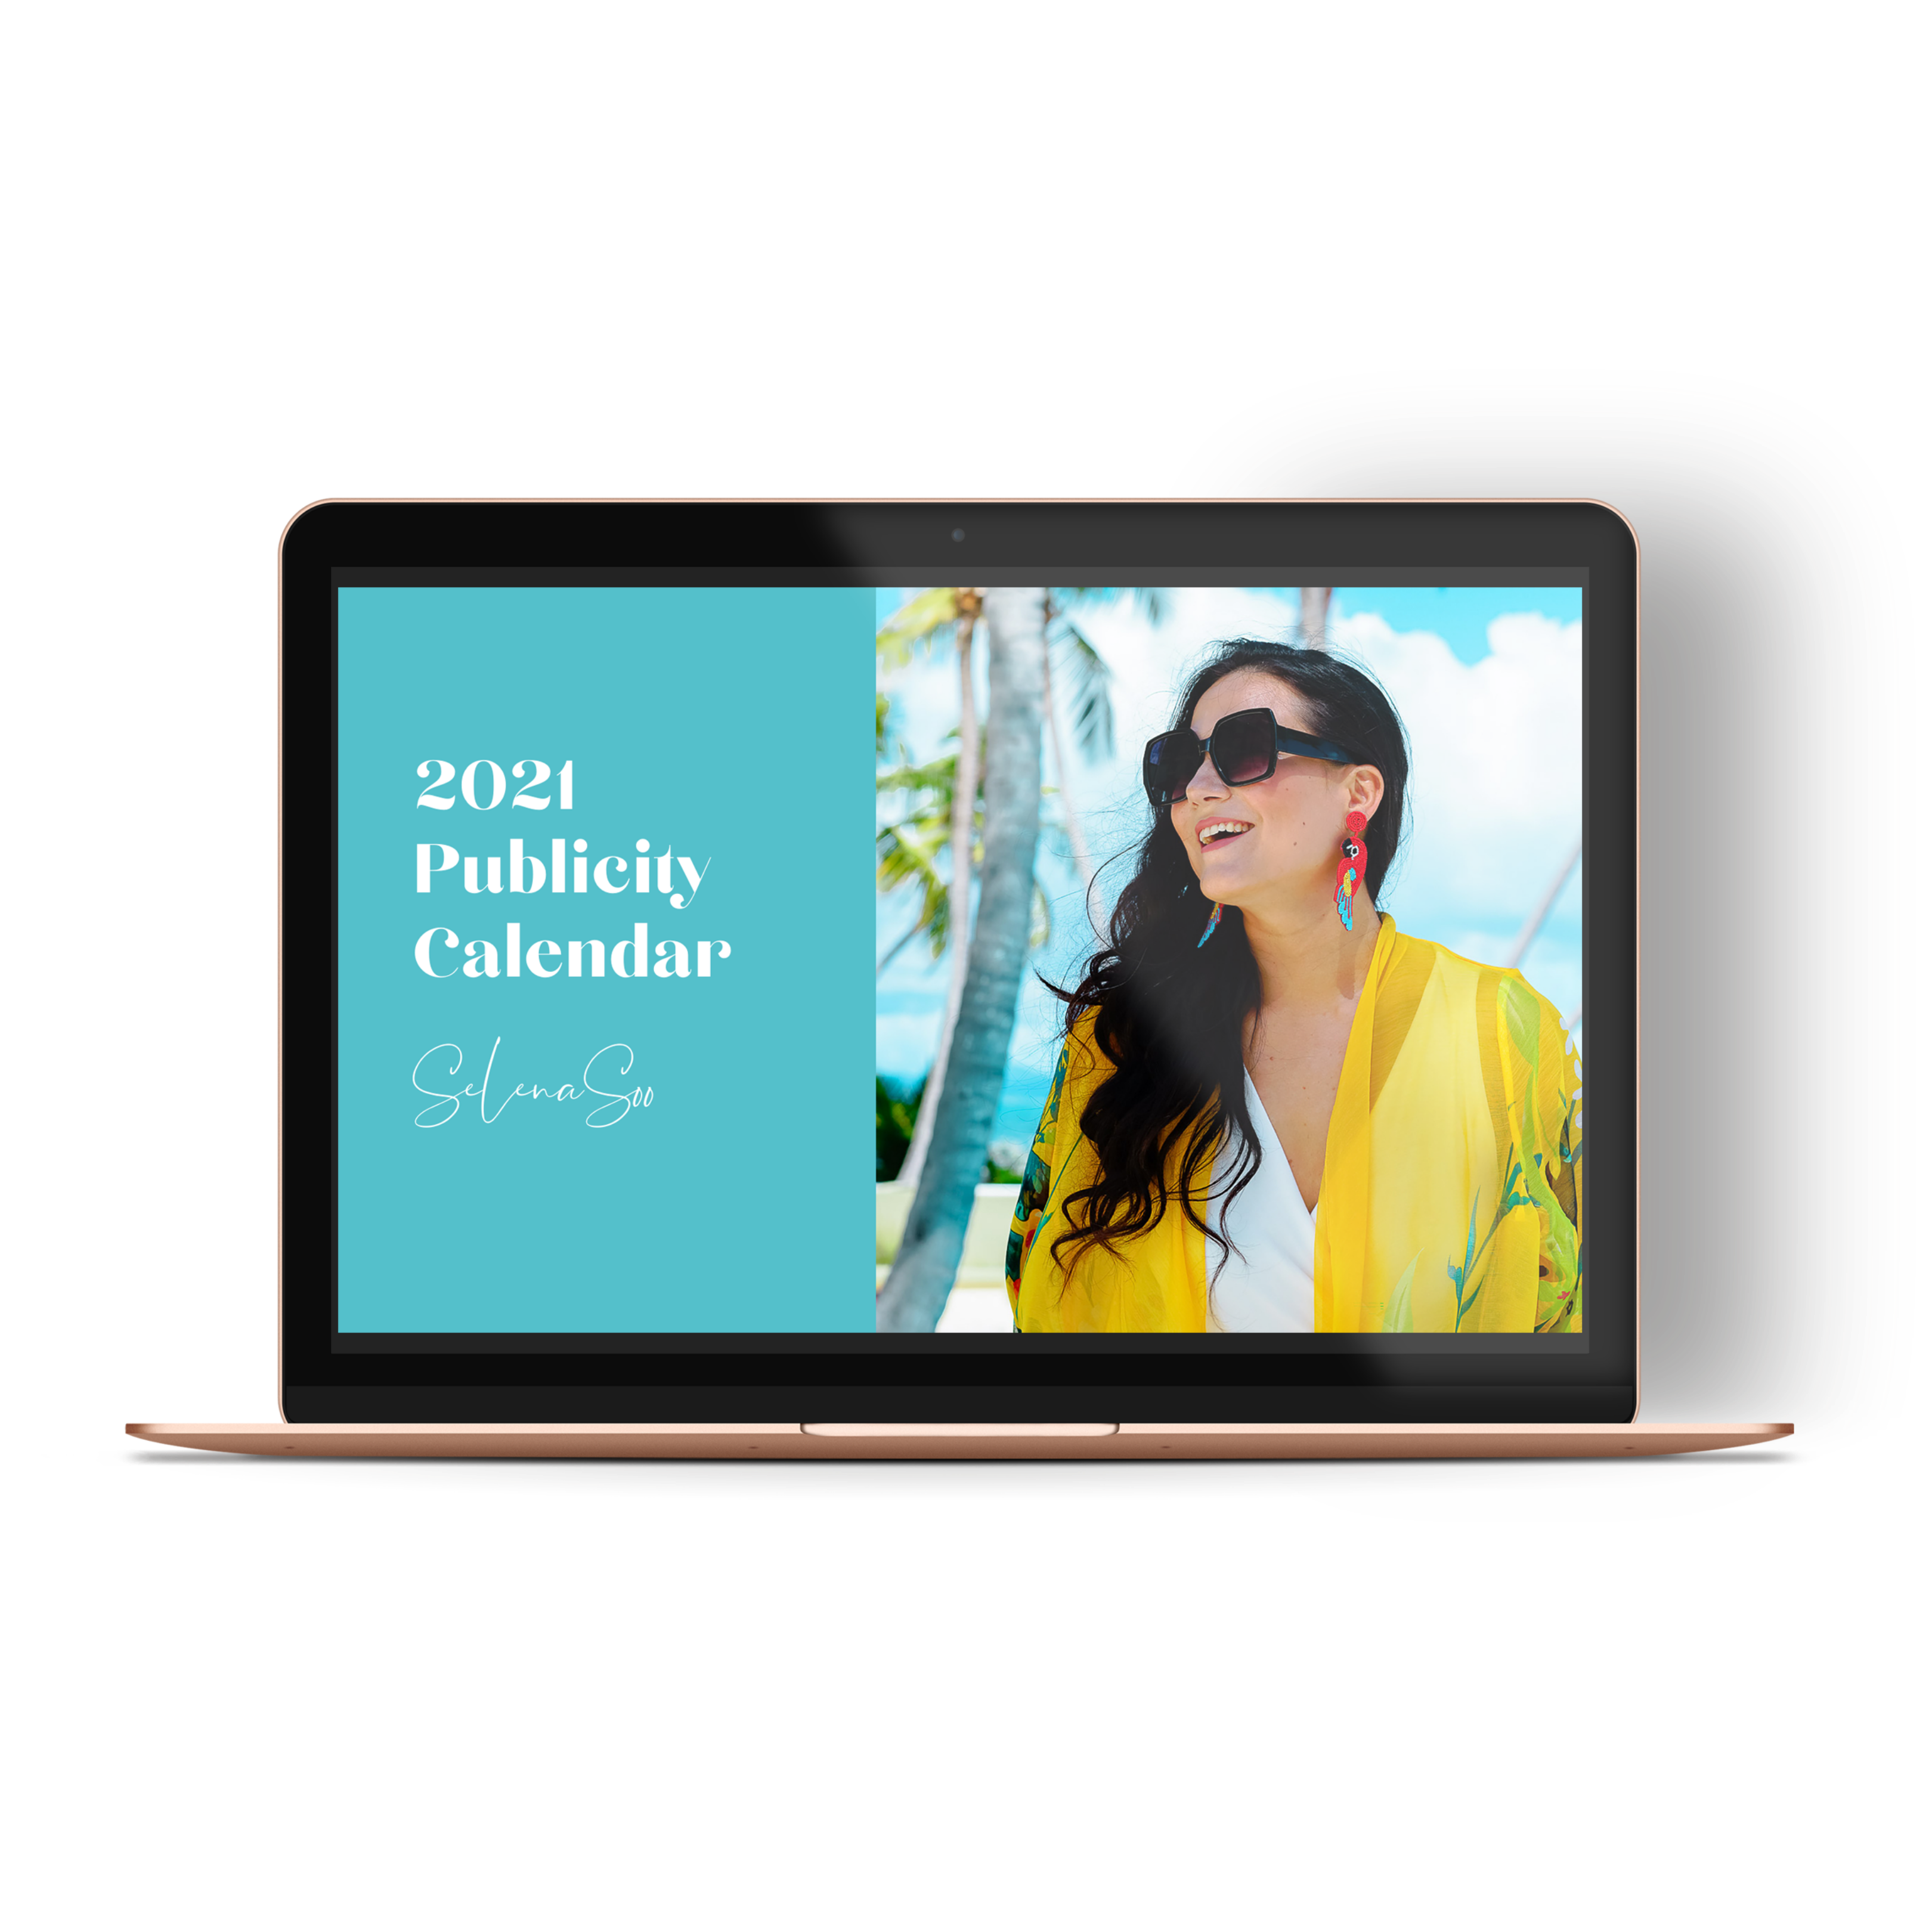 Christine Hansen Publicity Calendar